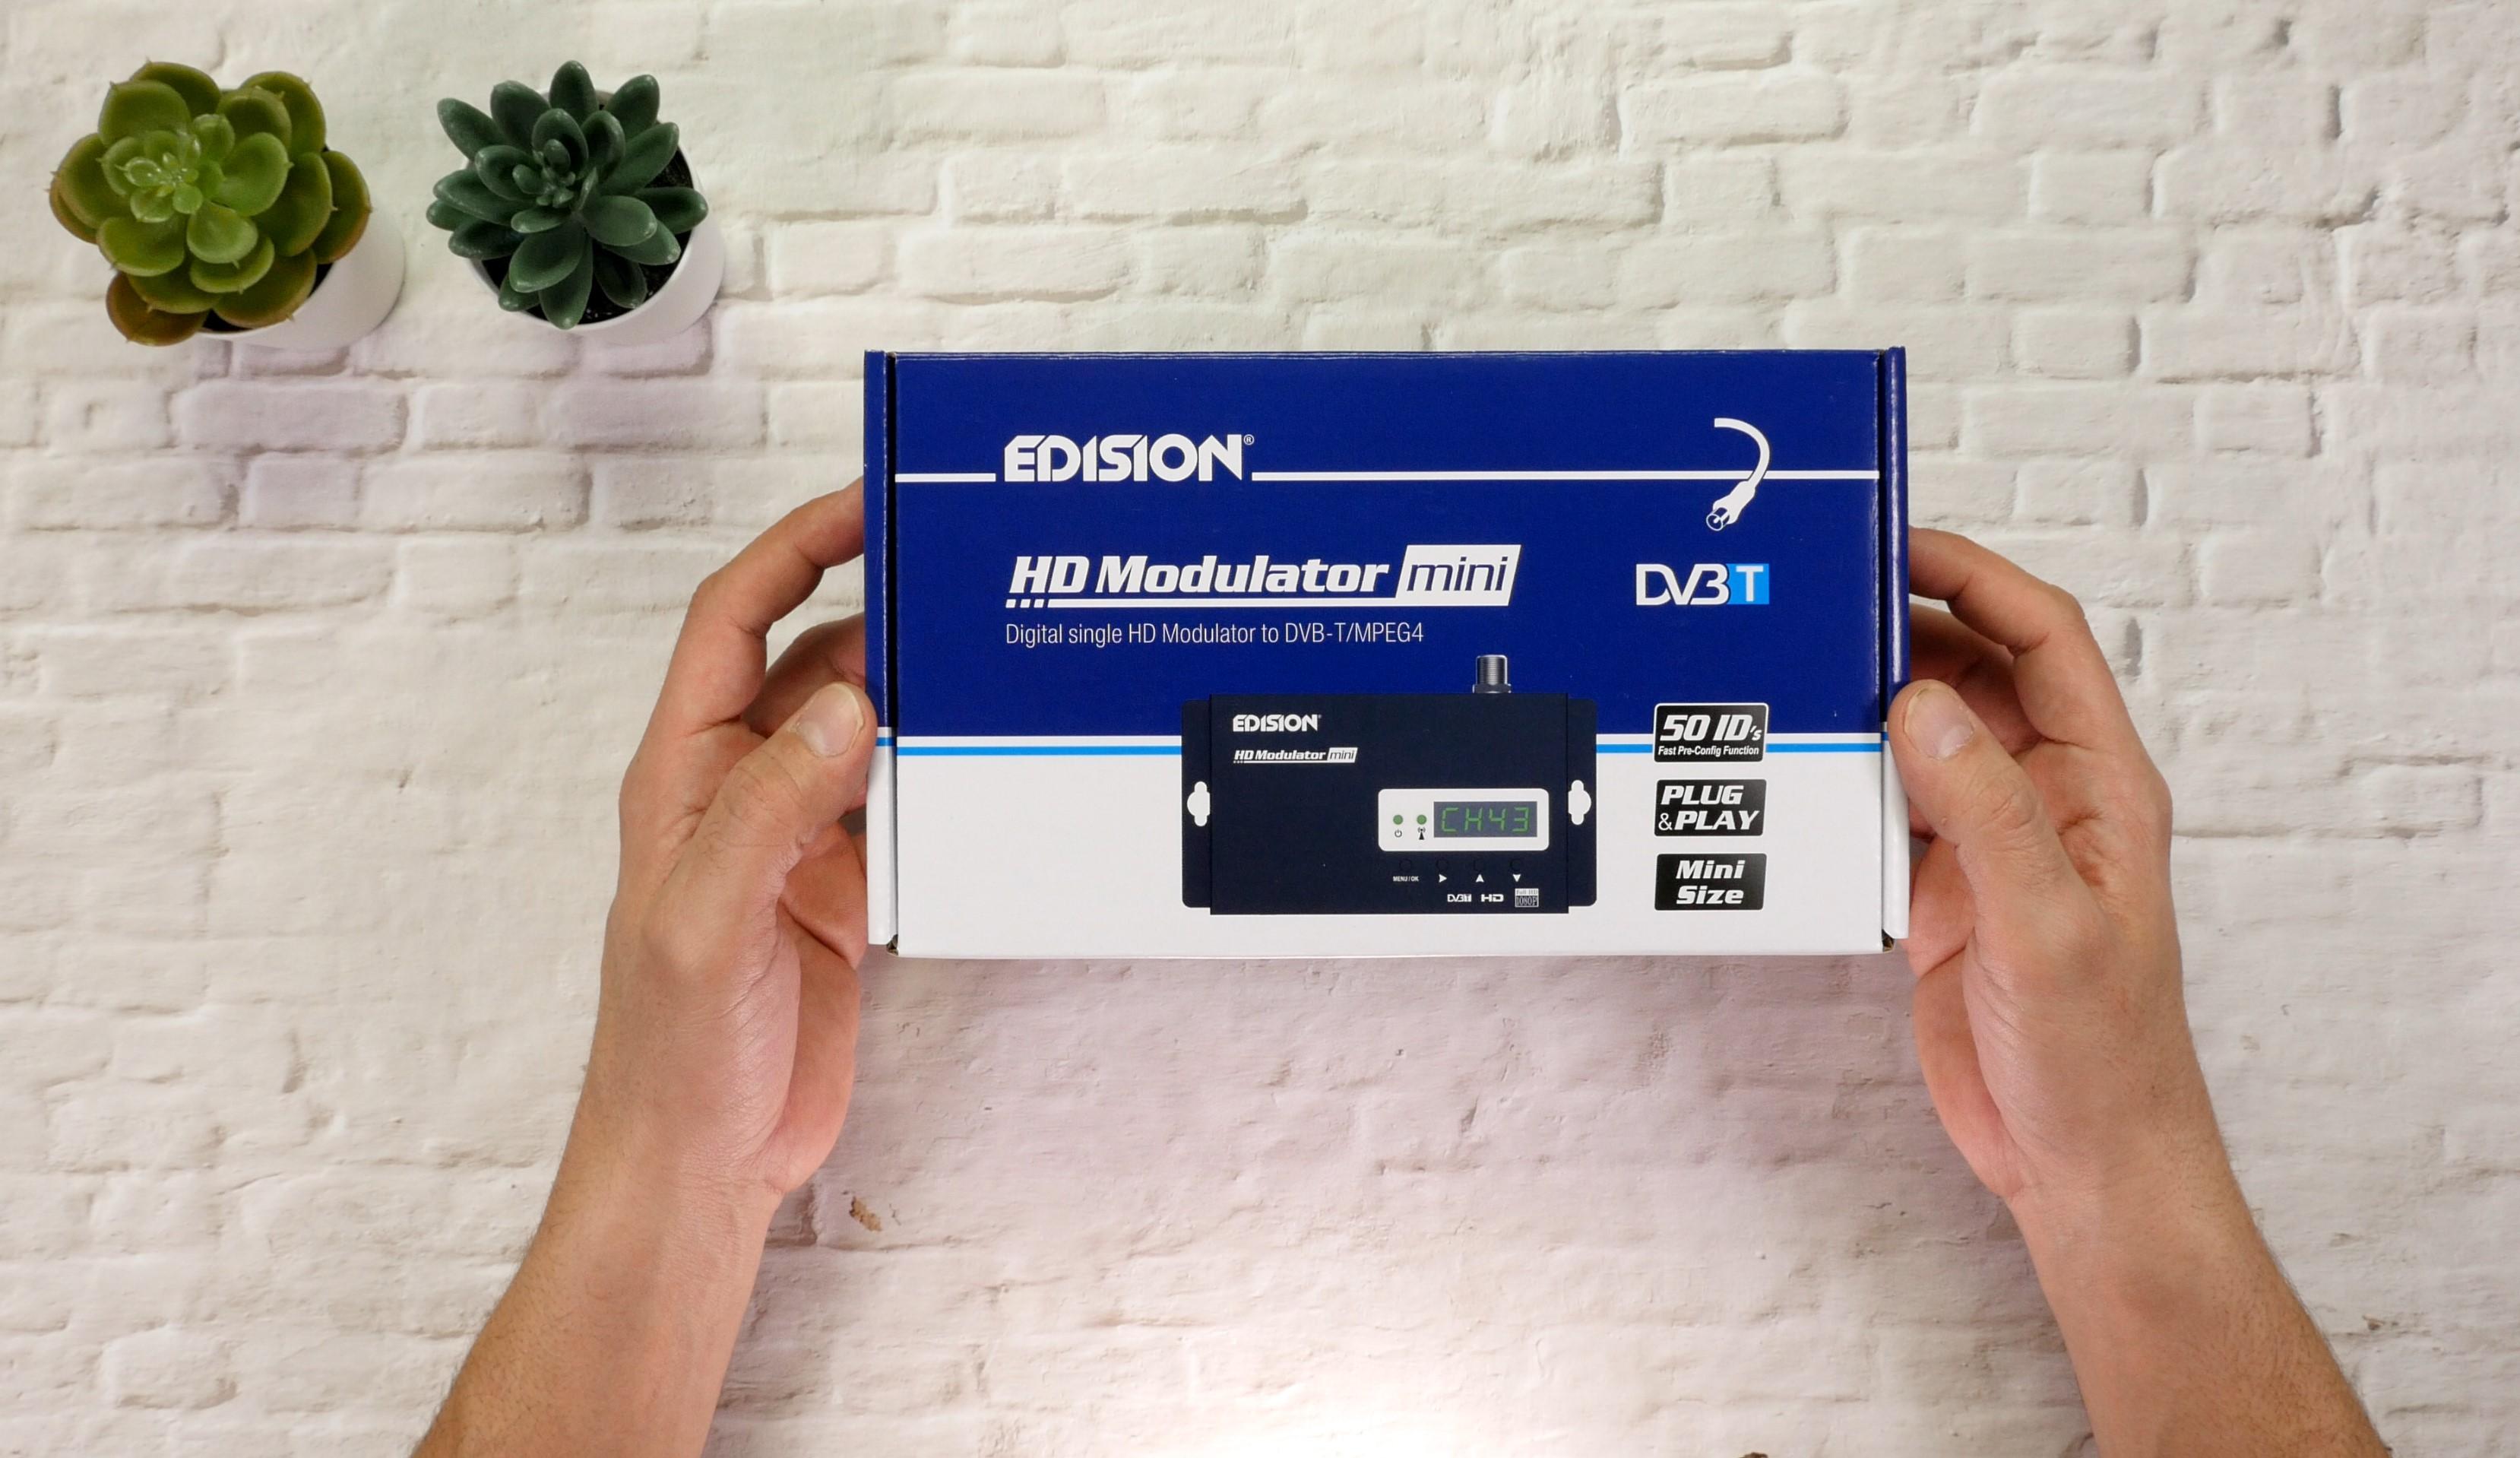 EDISION HDMI MODULATOR mini review Techblog